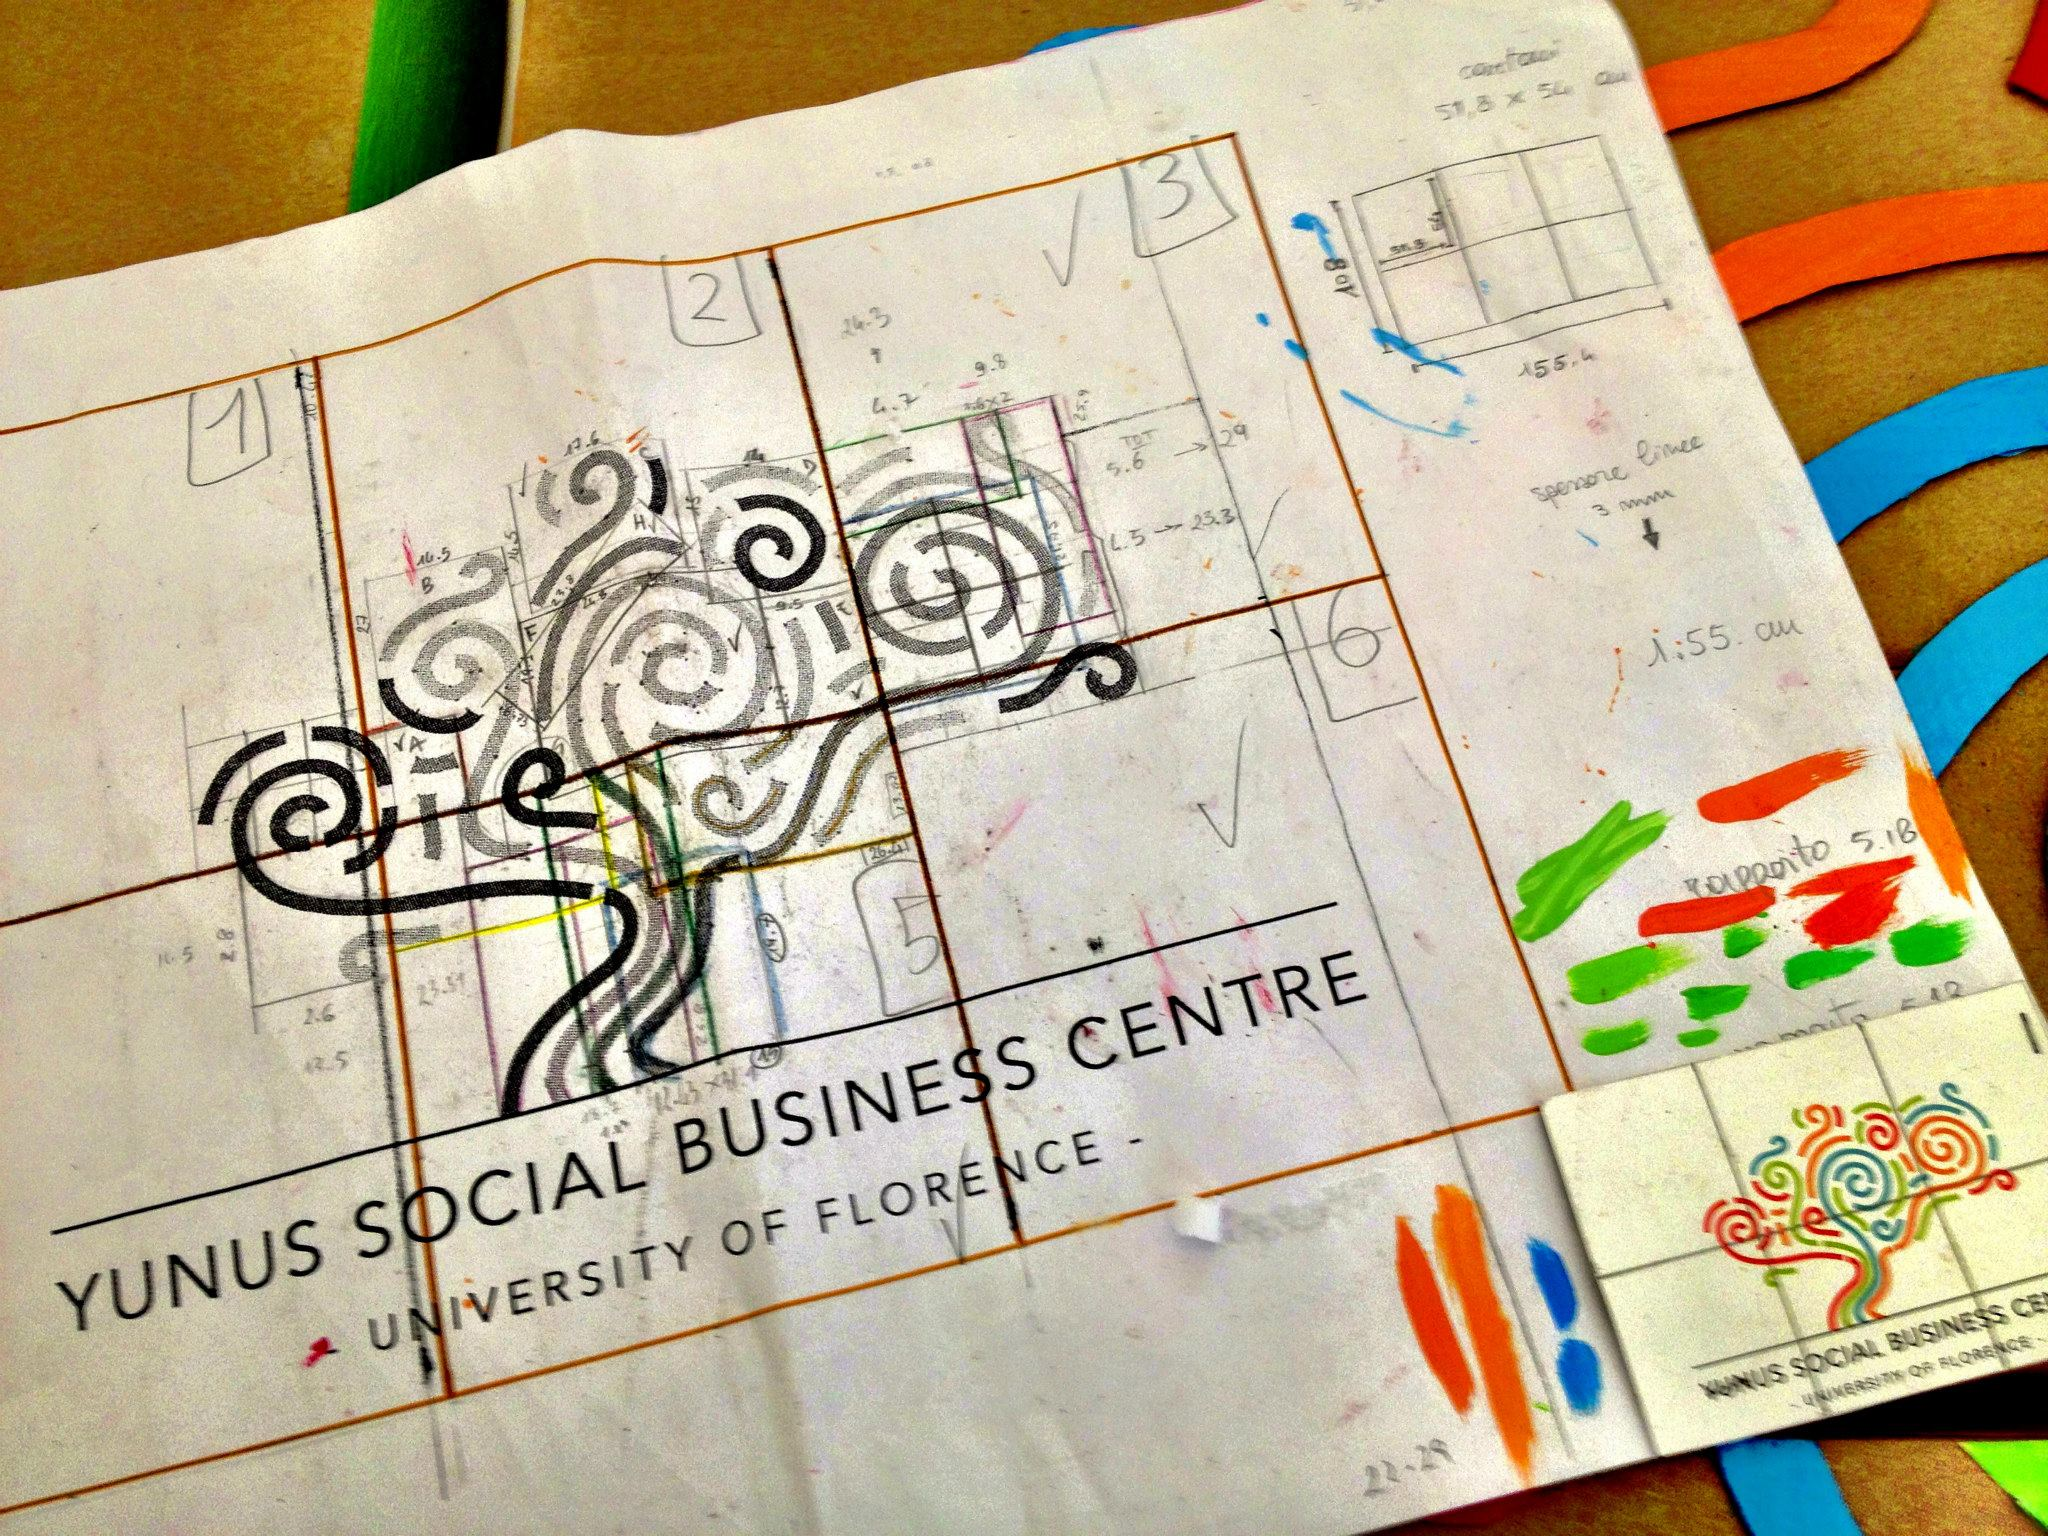 Internship at ARCO and Yunus Social Business Centre University of